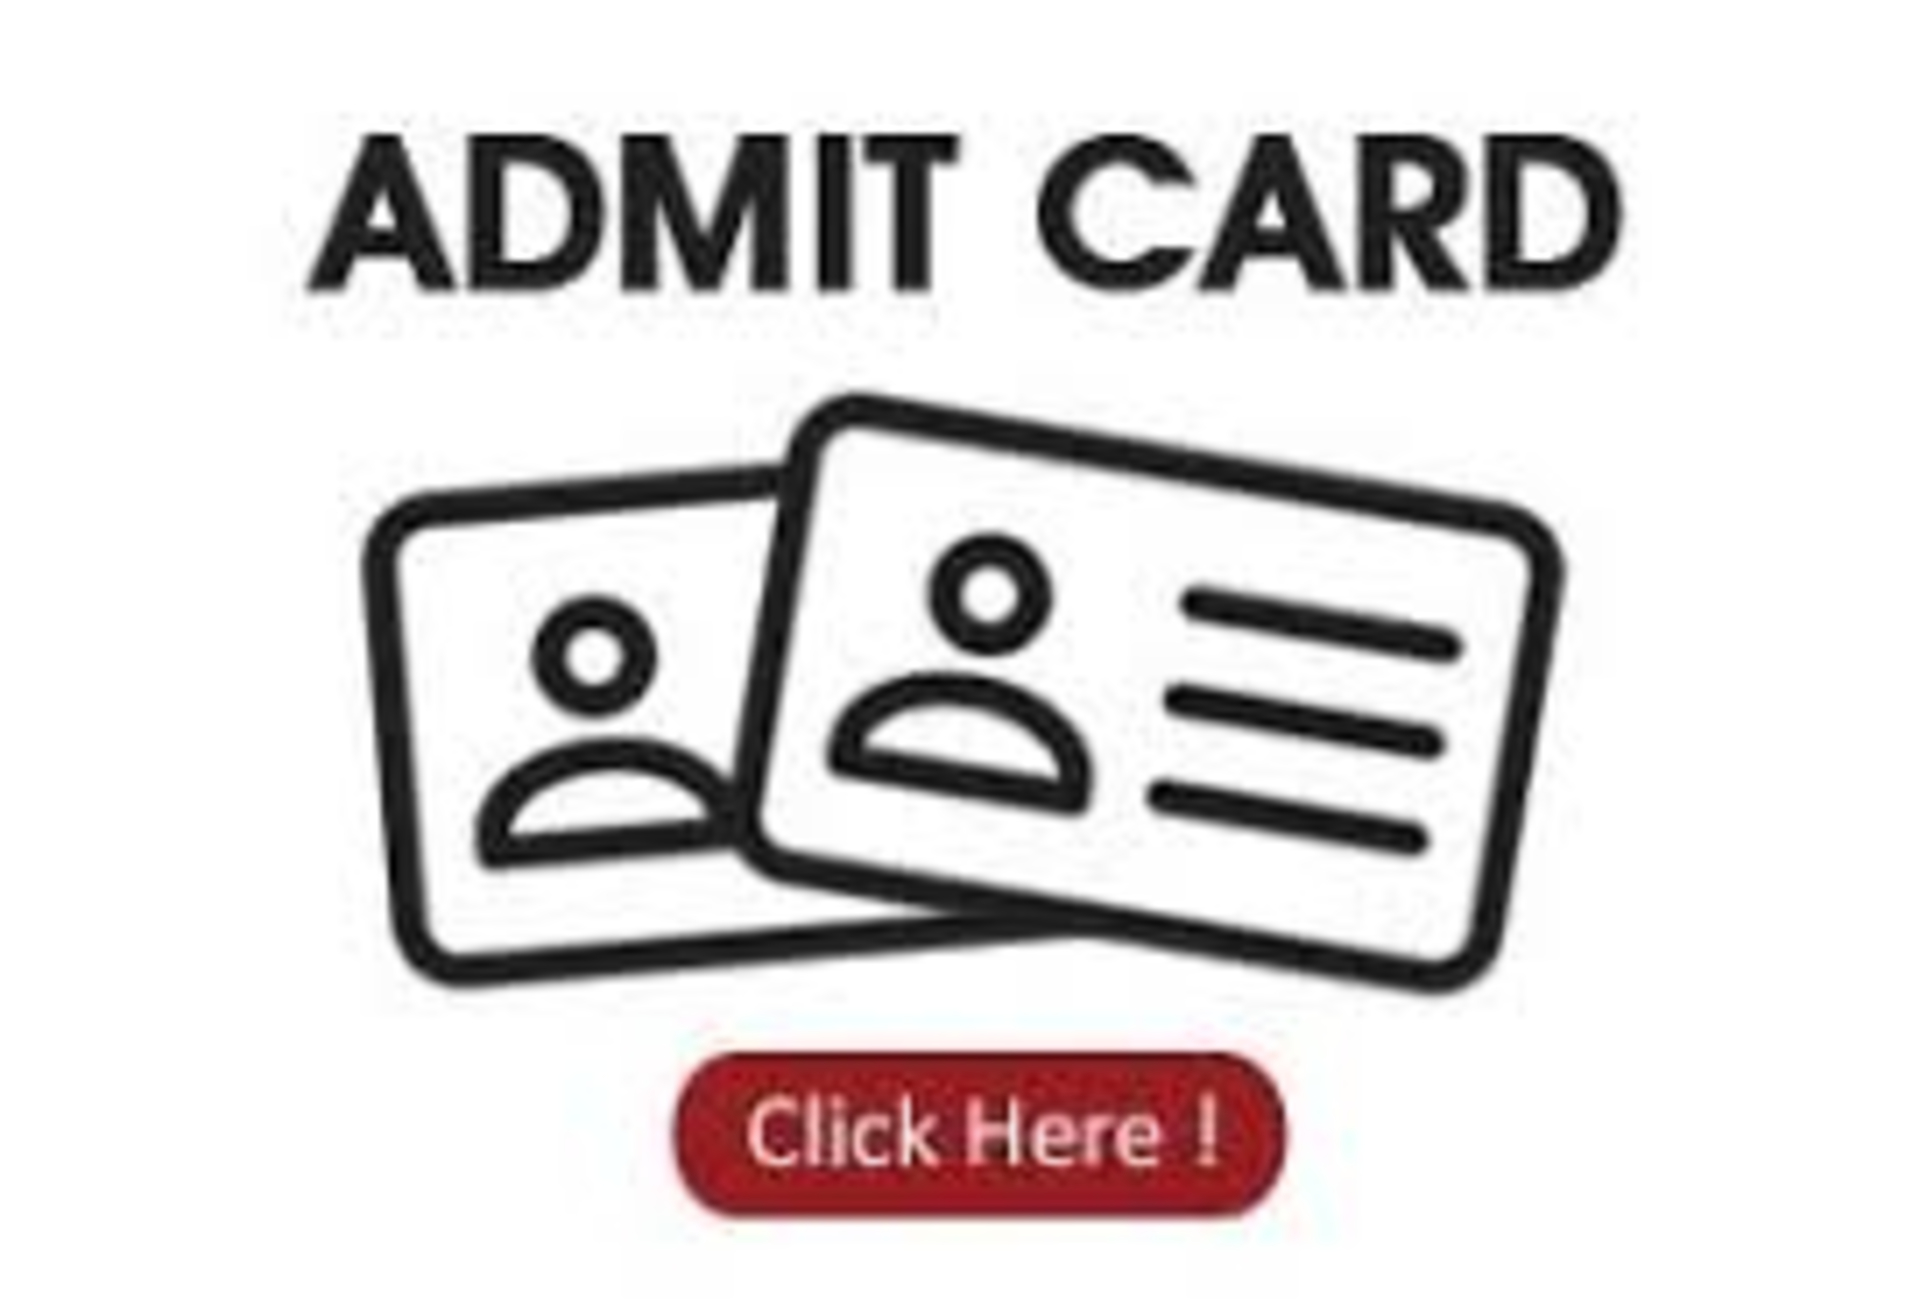 SAAT Admit Card 2019 image